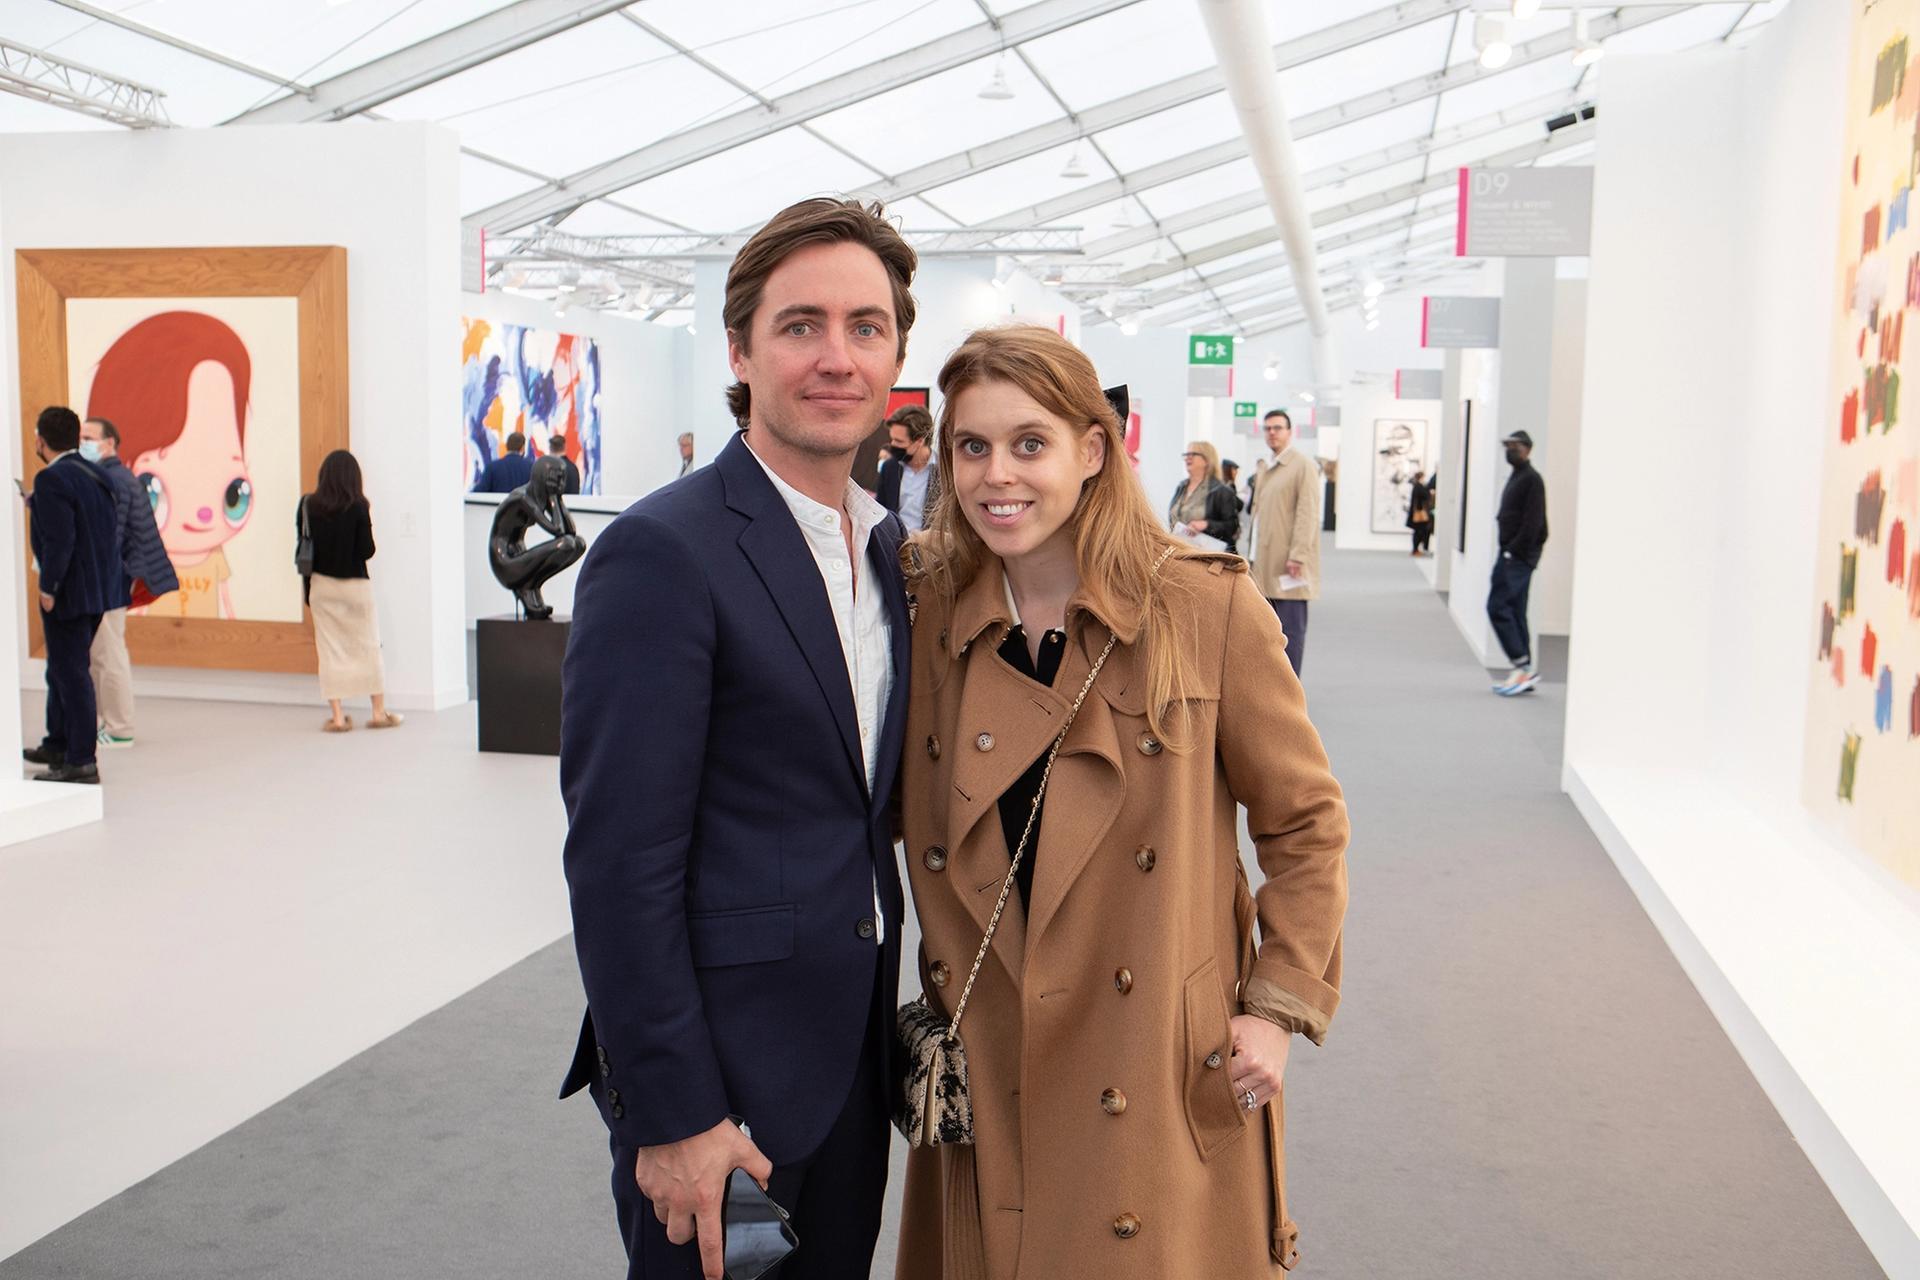 Princess Beatrice of York and her husband Edoardo Mapelli Mozzi Photo: David Owens